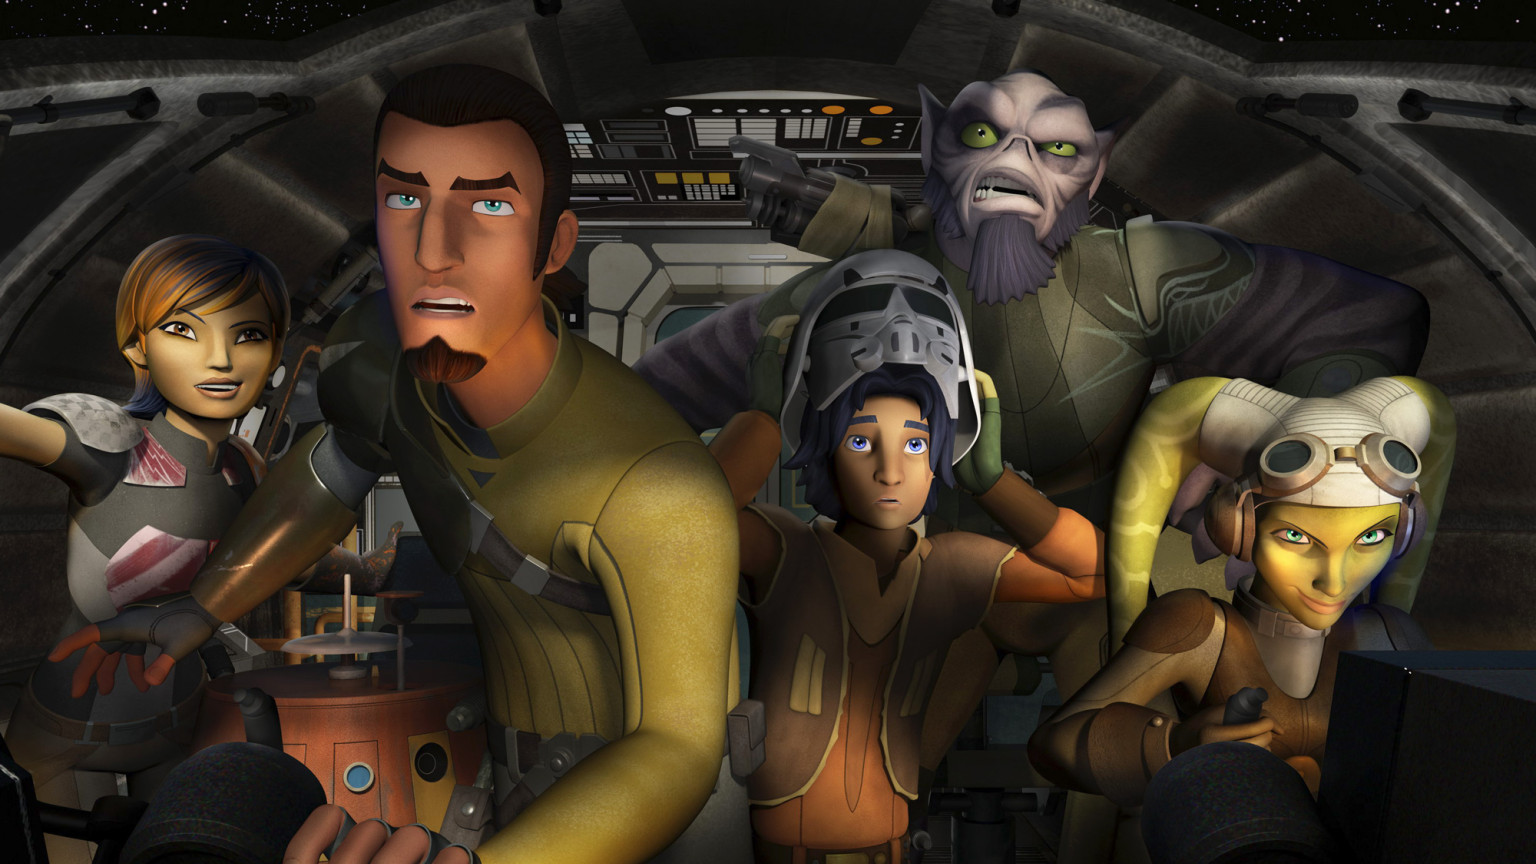 Tonight: Premieres of 'Star Wars:Rebels', 'Legend of Korra'